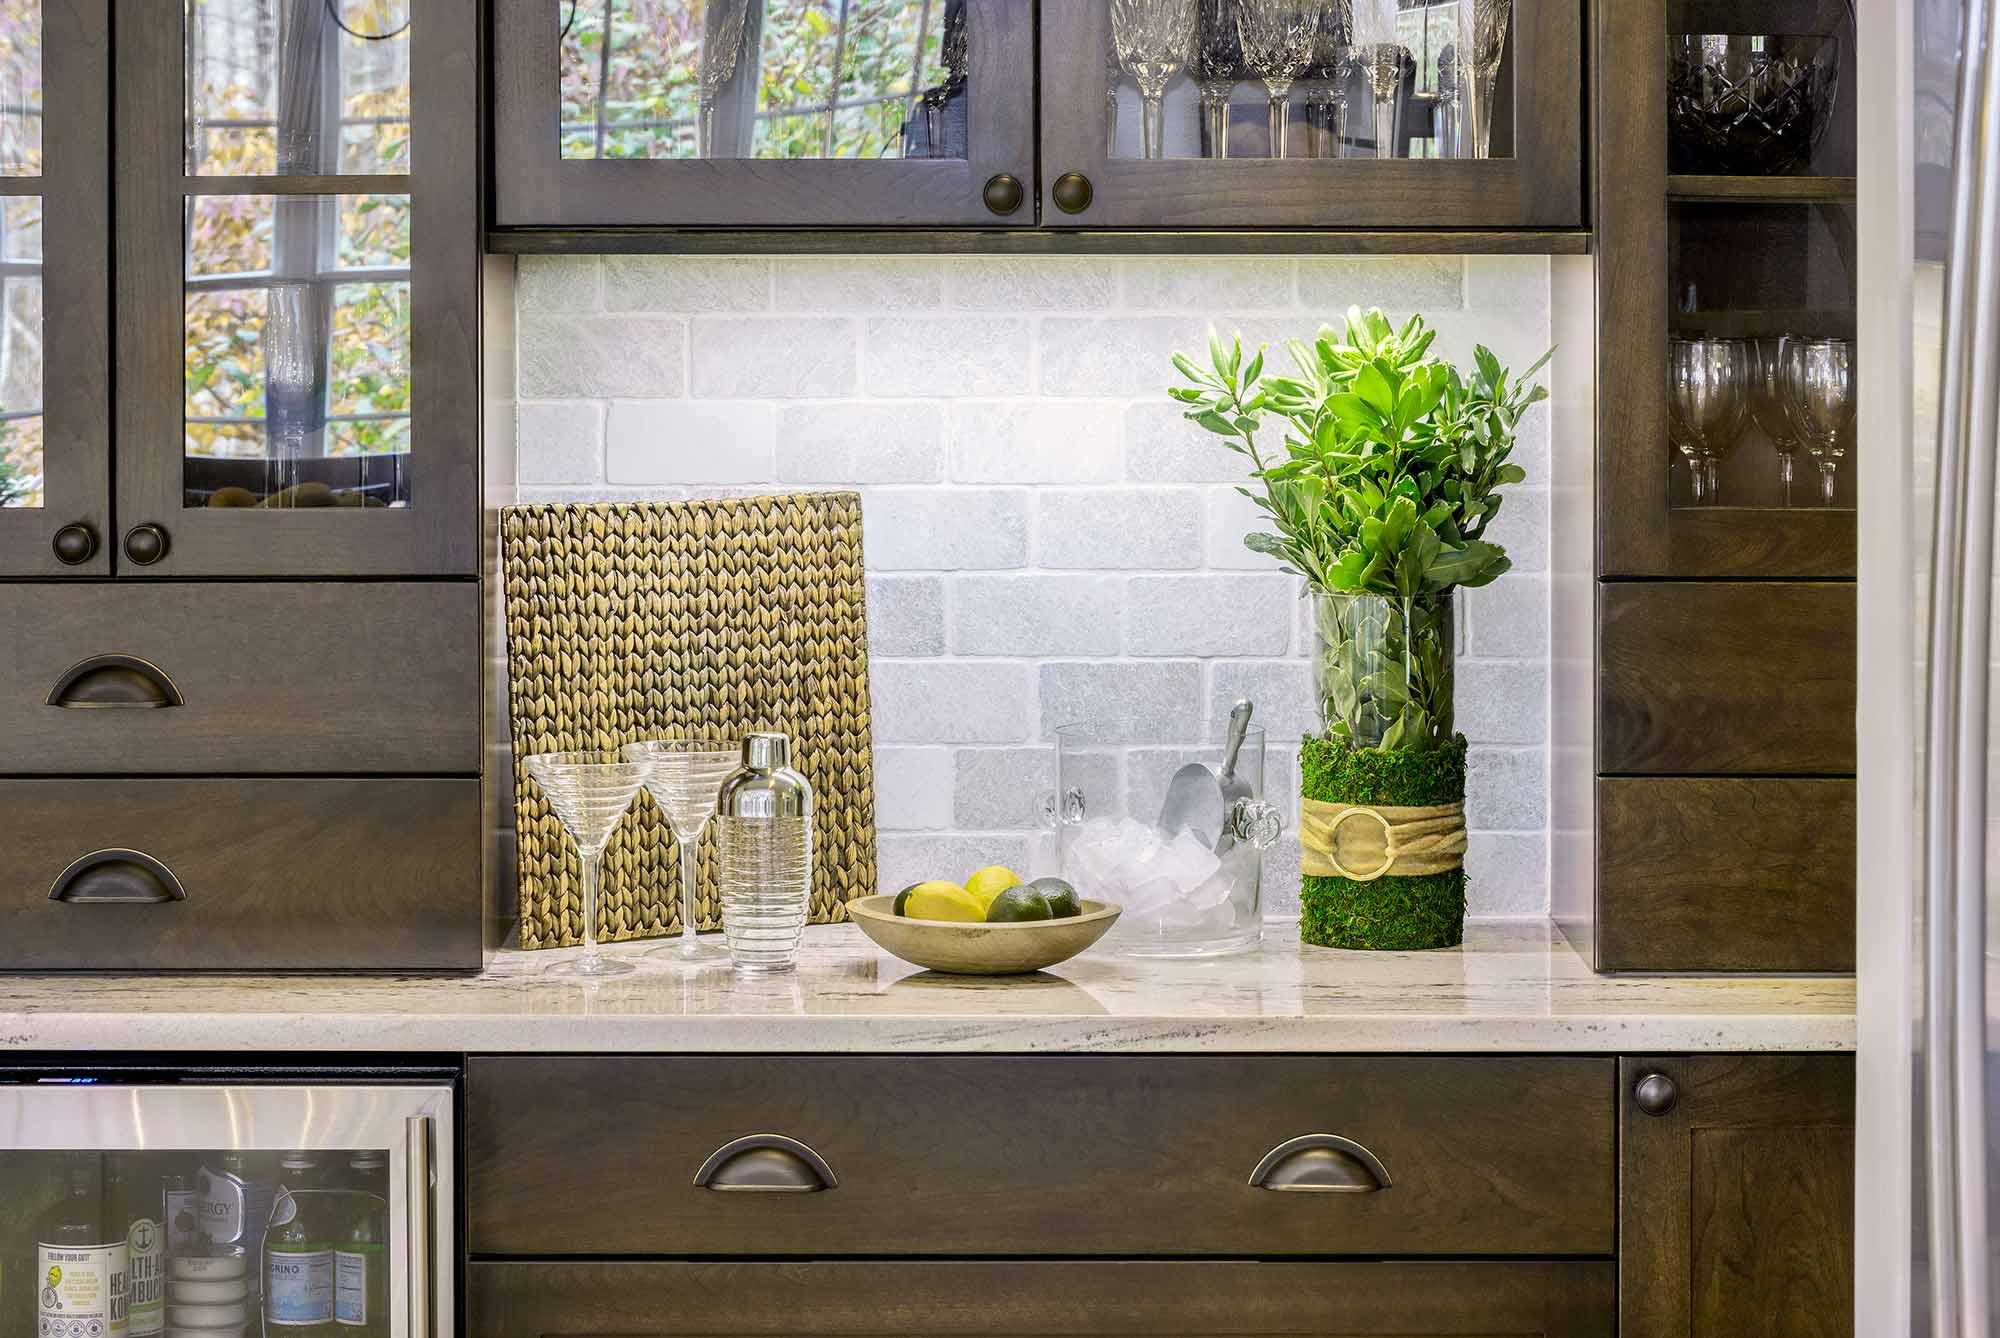 Duke Kitchen Counter & Cabinets